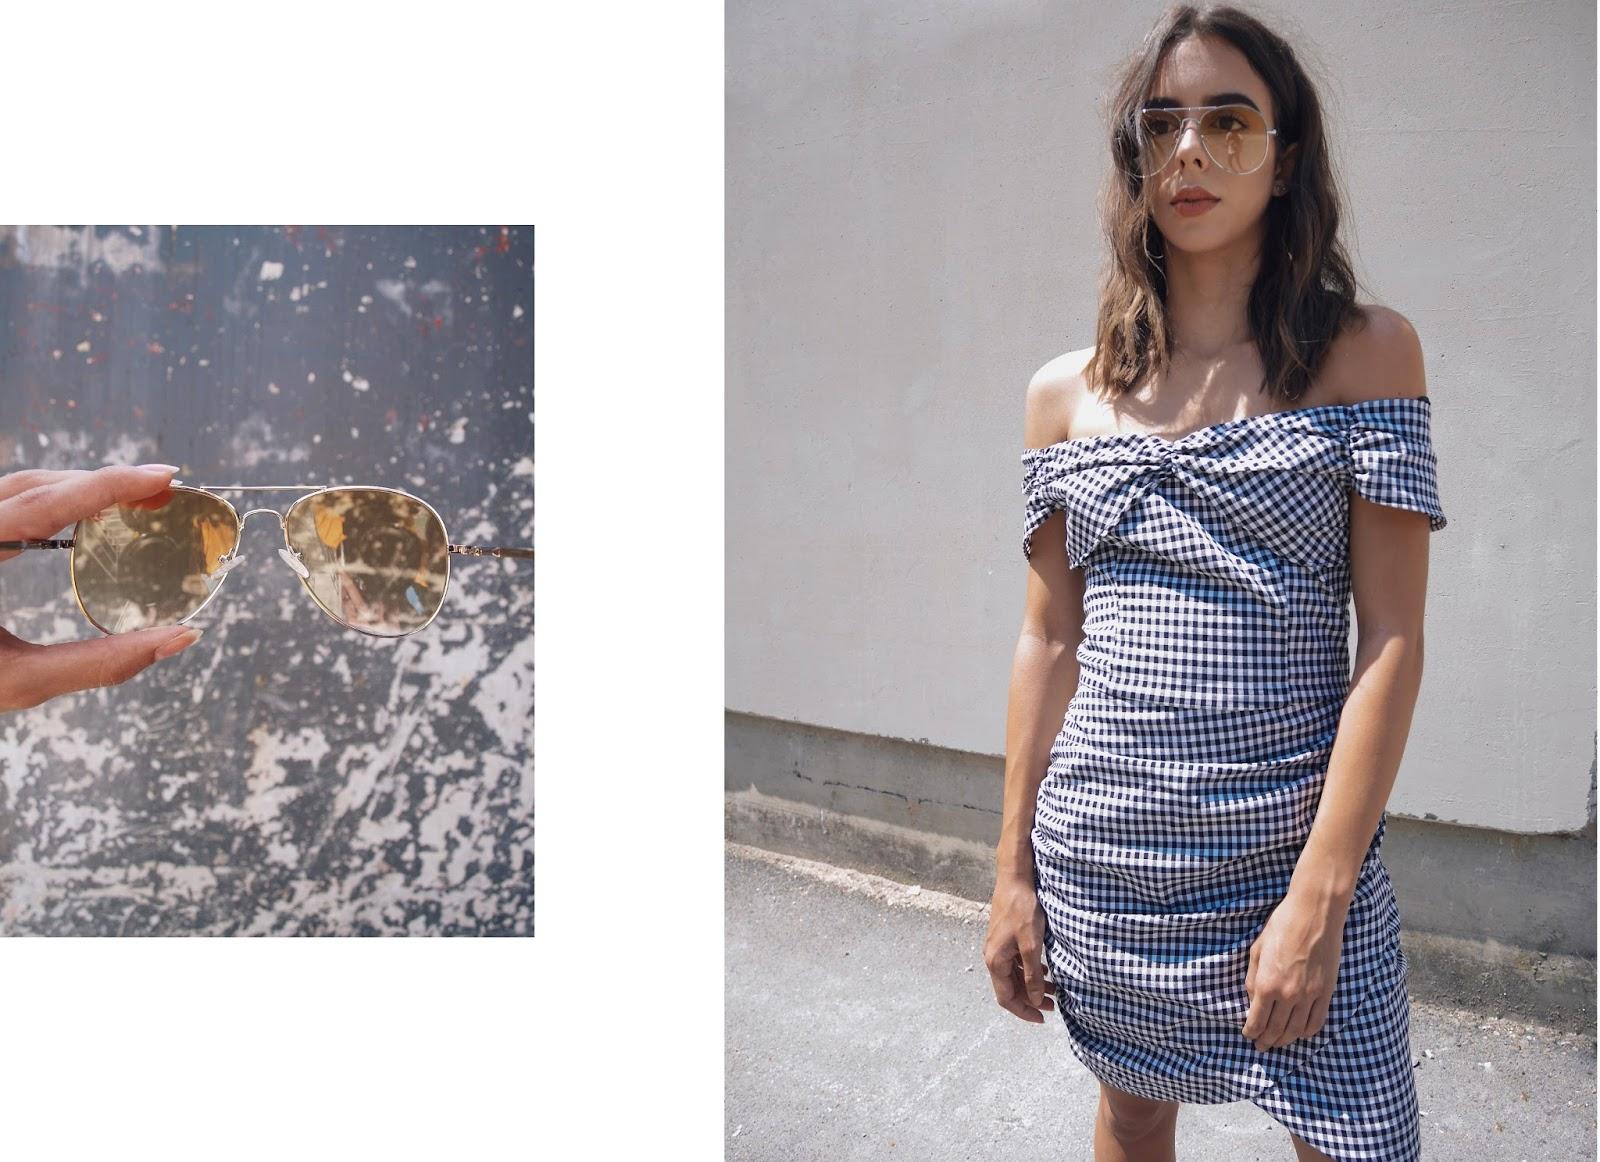 VICHY-DRESS-ROBE-CARREAUX-LUNETTES-TEINTES-JAUNES-COASTALANDCO-BLOG-HENDAYE-PAYSBASQUE-TENUE-INSPIRATION-2017-ETE